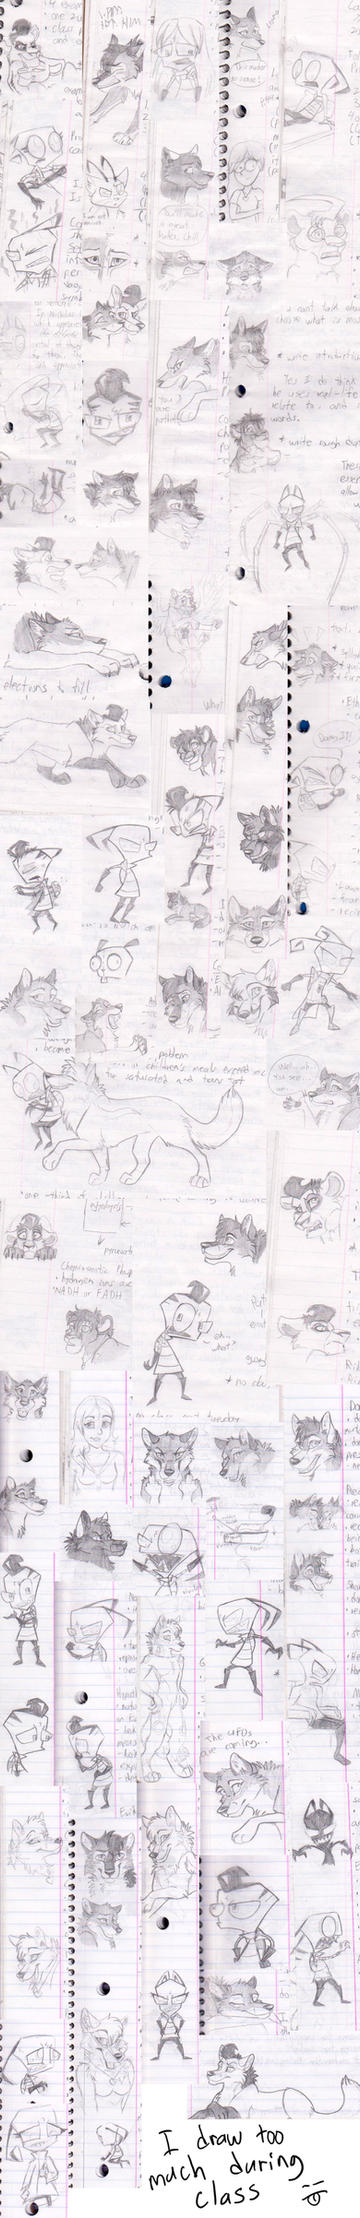 Margi-doodle Dump by WindWo1f